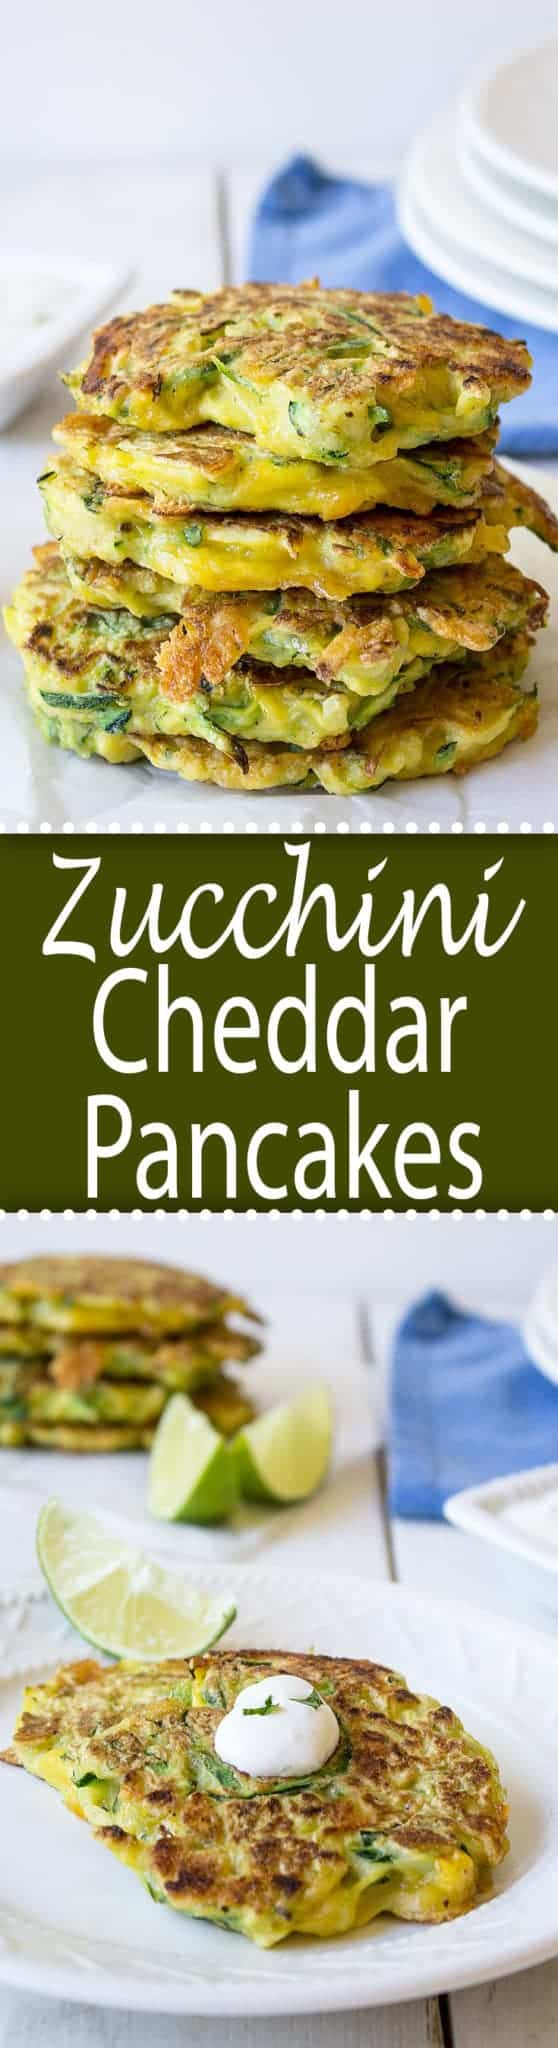 Zucchini Cheddar Pancakes beyondthechickencoop.com